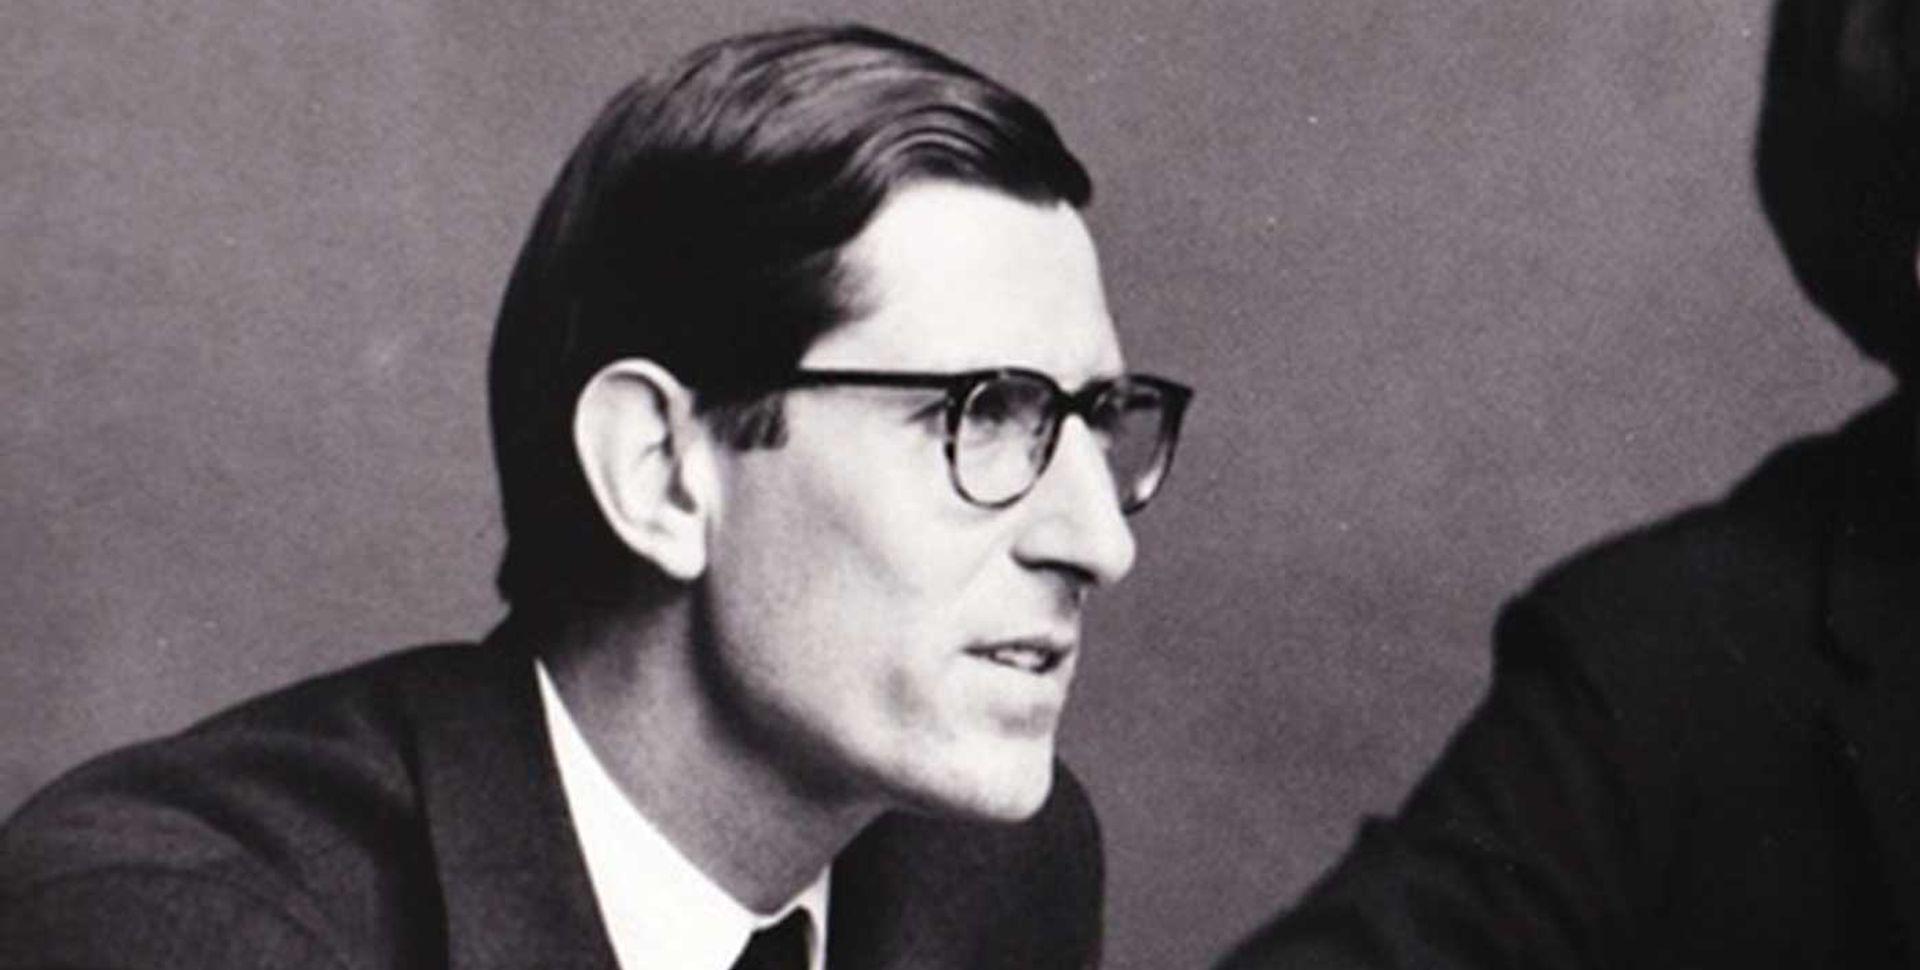 Peregrine Pollen, President of Parke-Bernet, New York 1966-72 Courtesy of Pollen family